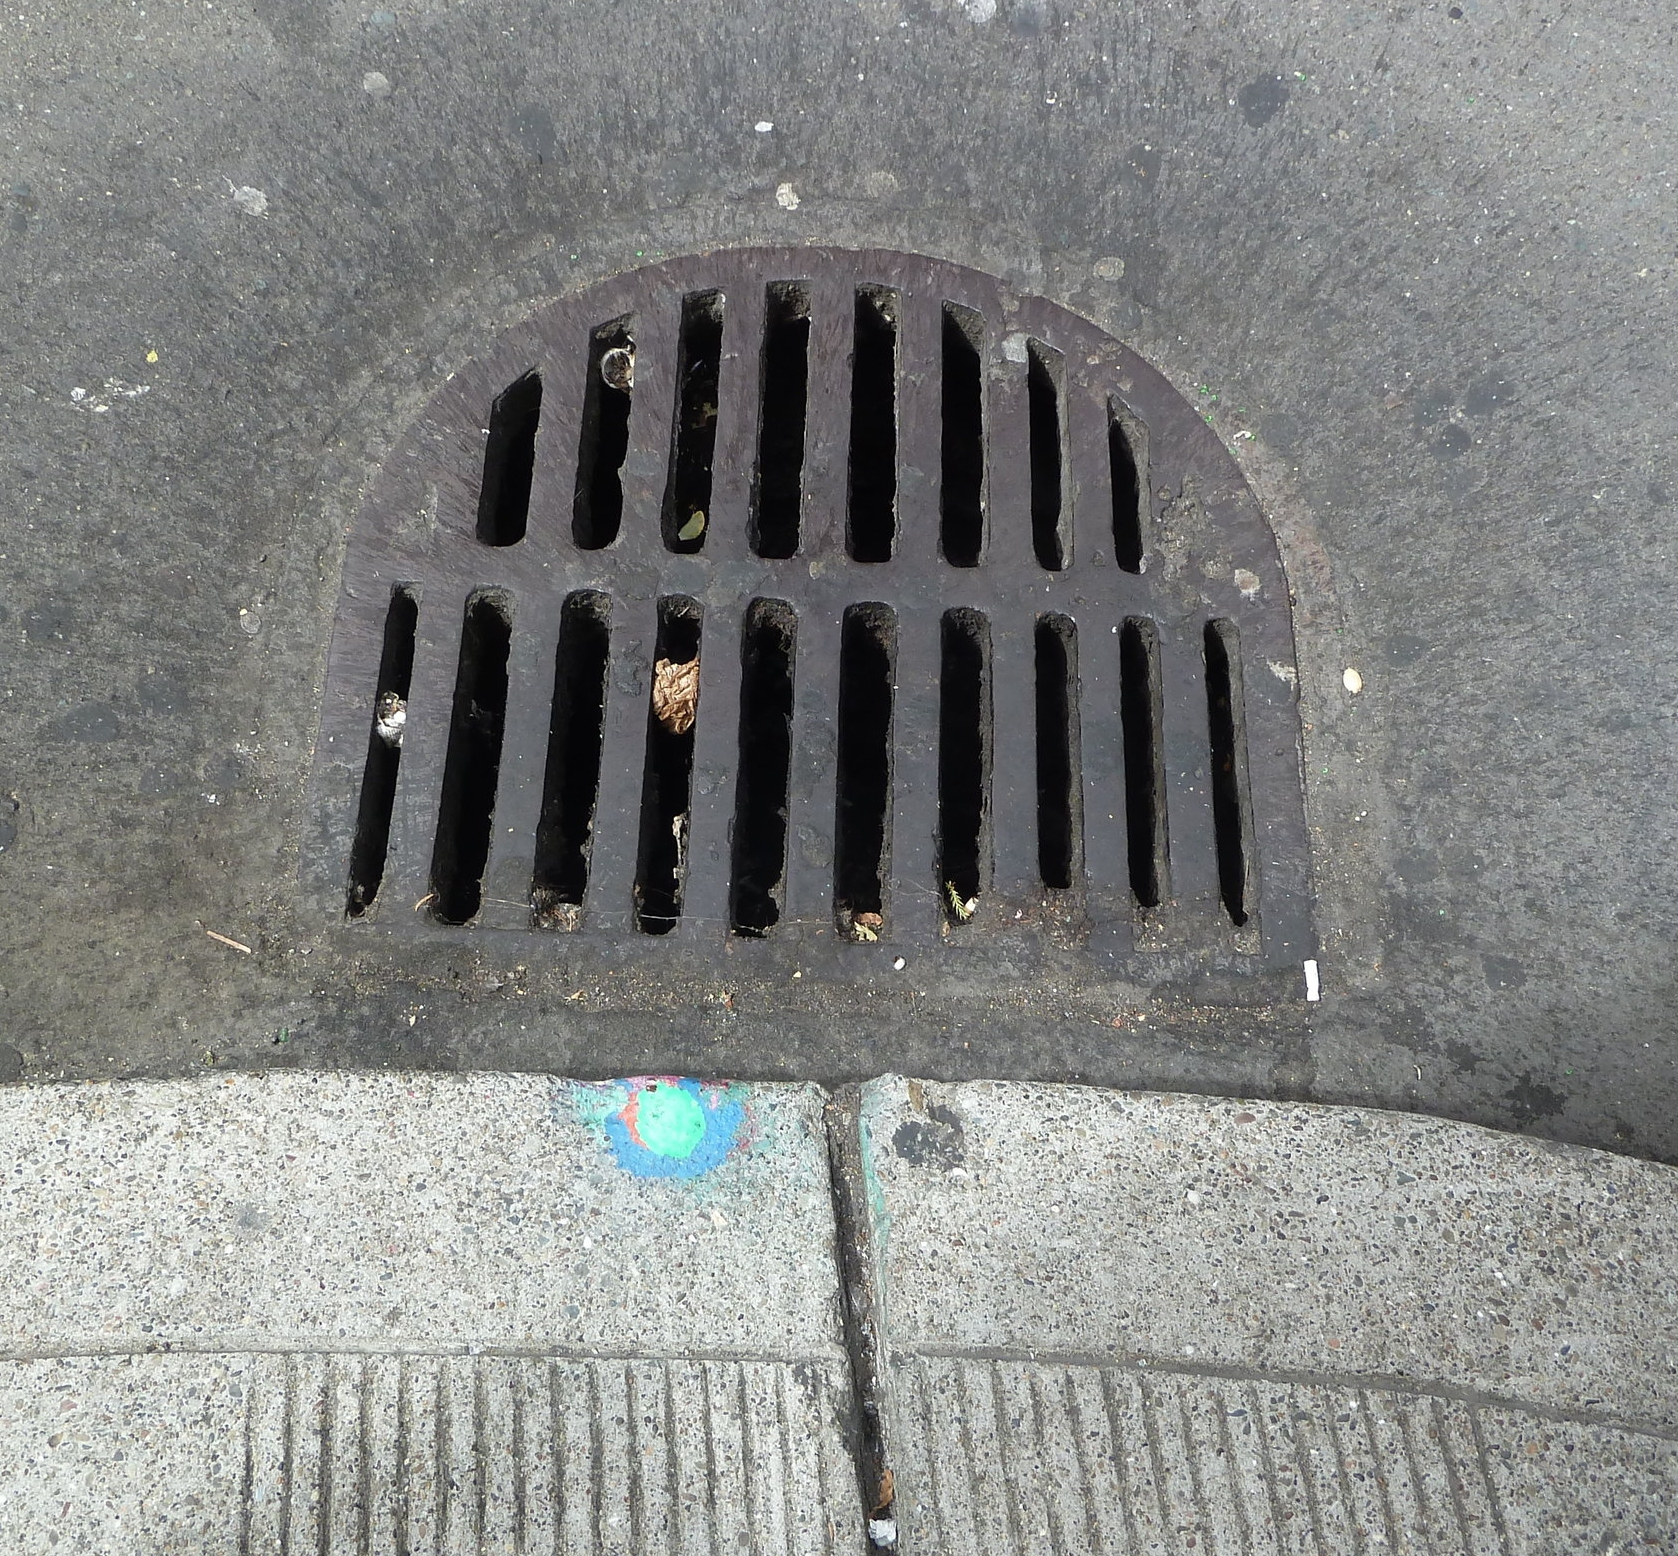 Sewer markings San Francisco